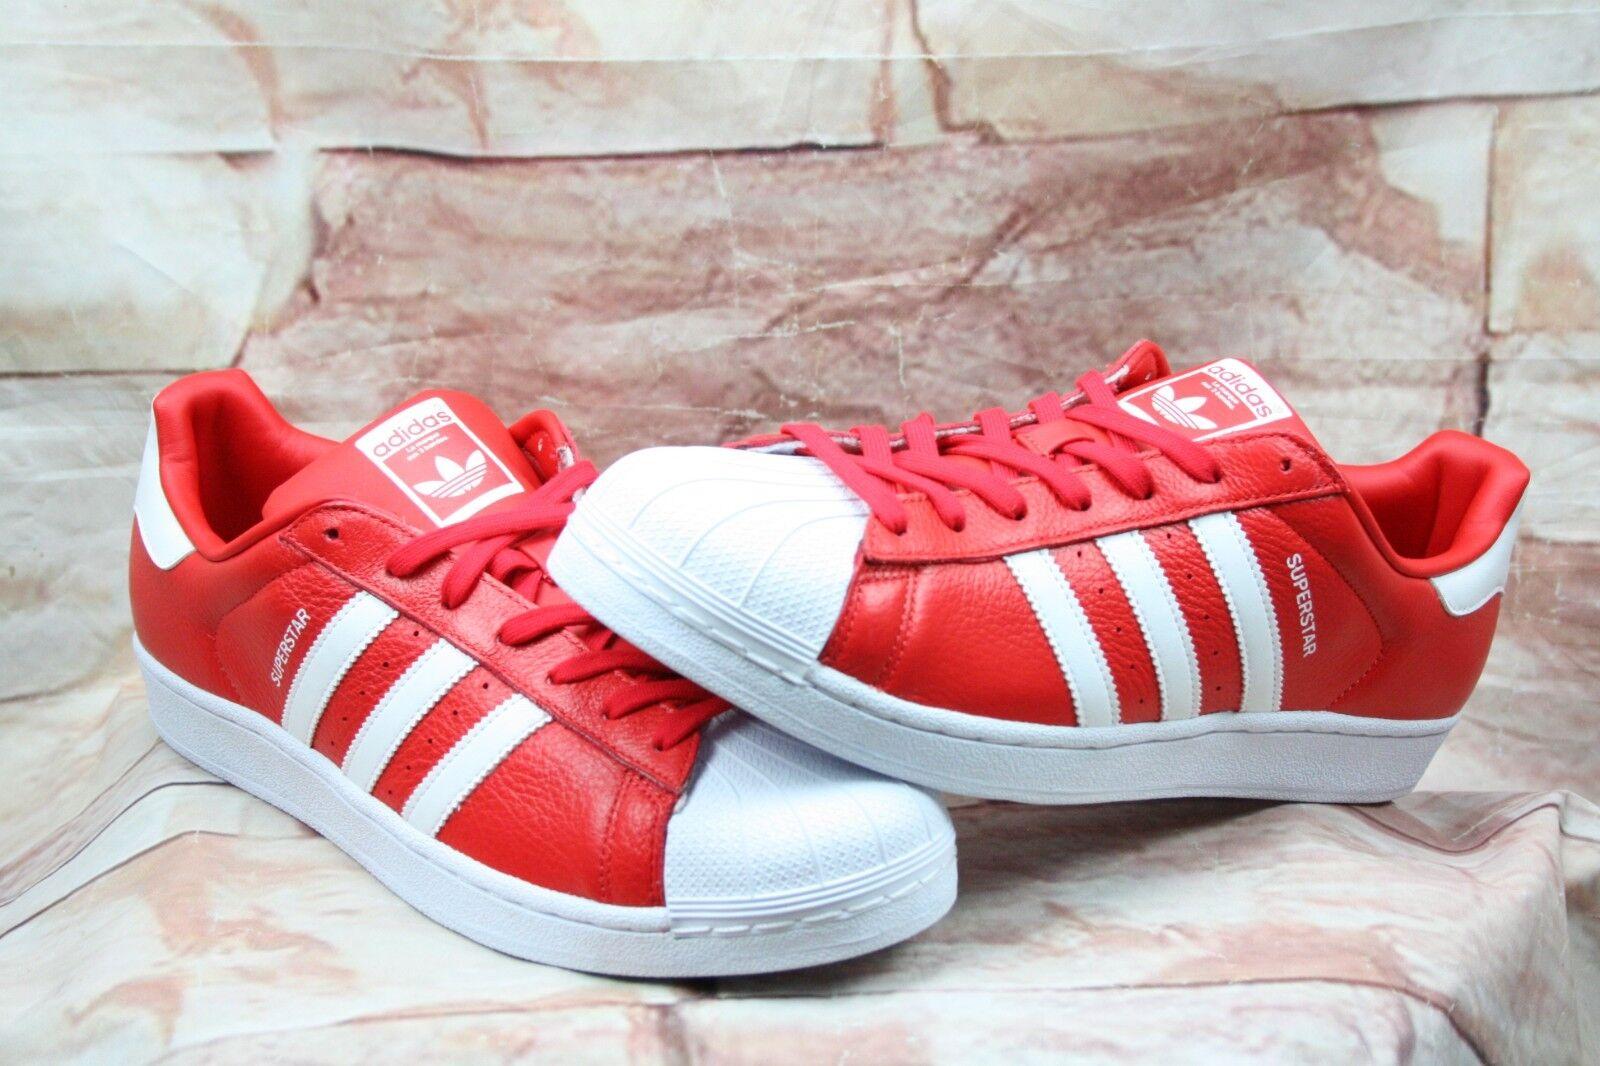 Adidas originals superstar männer - 13 rot / weißen turnschuhen - männer bb2240 658609